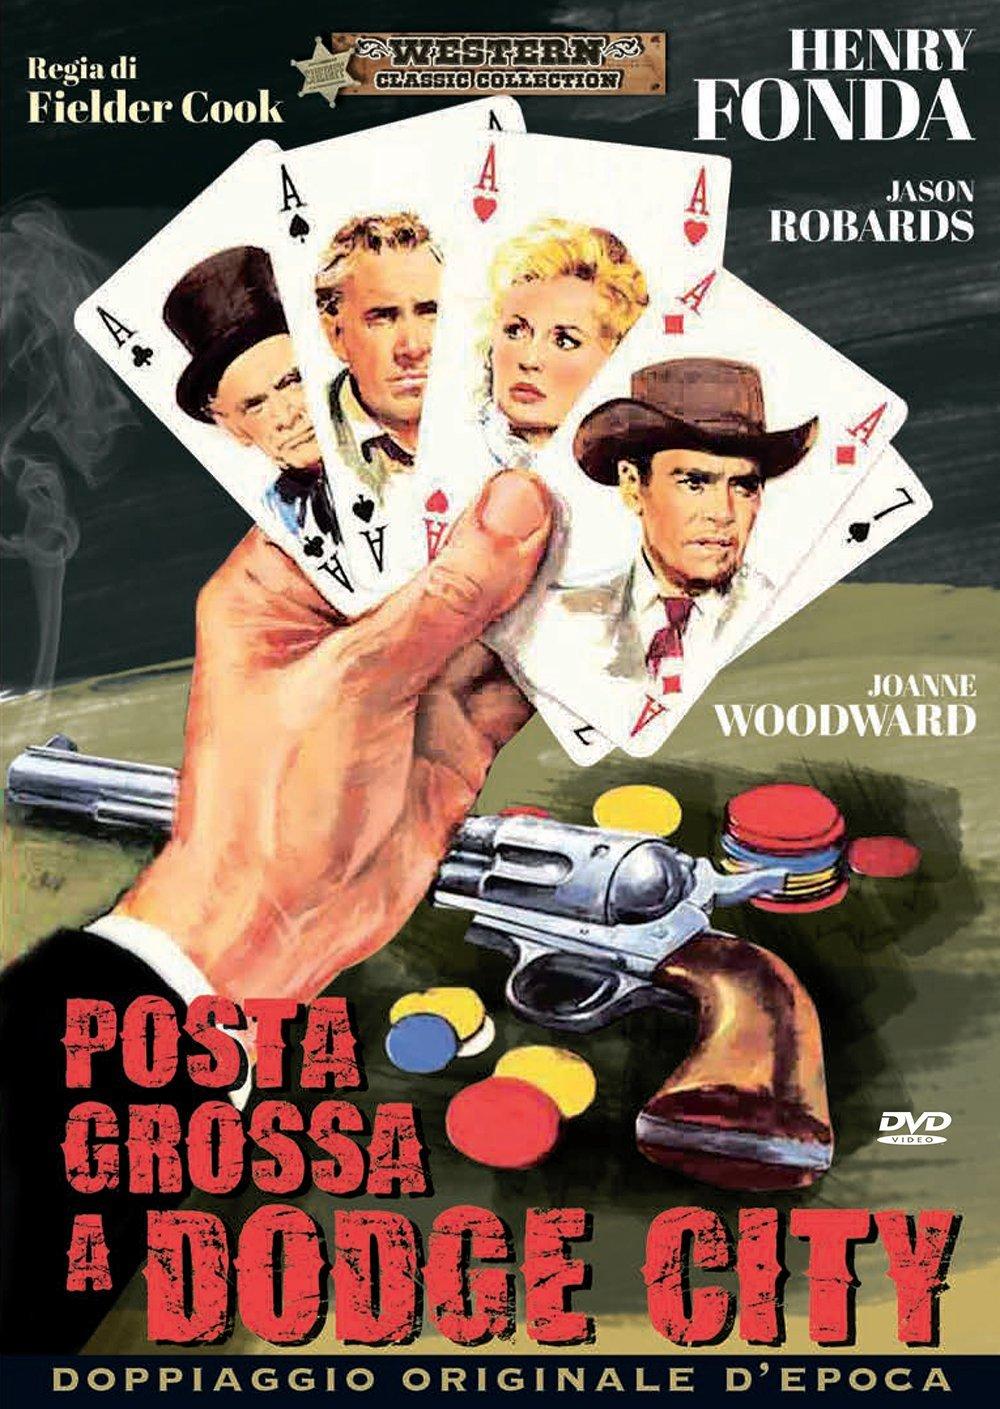 POSTA GROSSA A DODGE CITY (DVD)